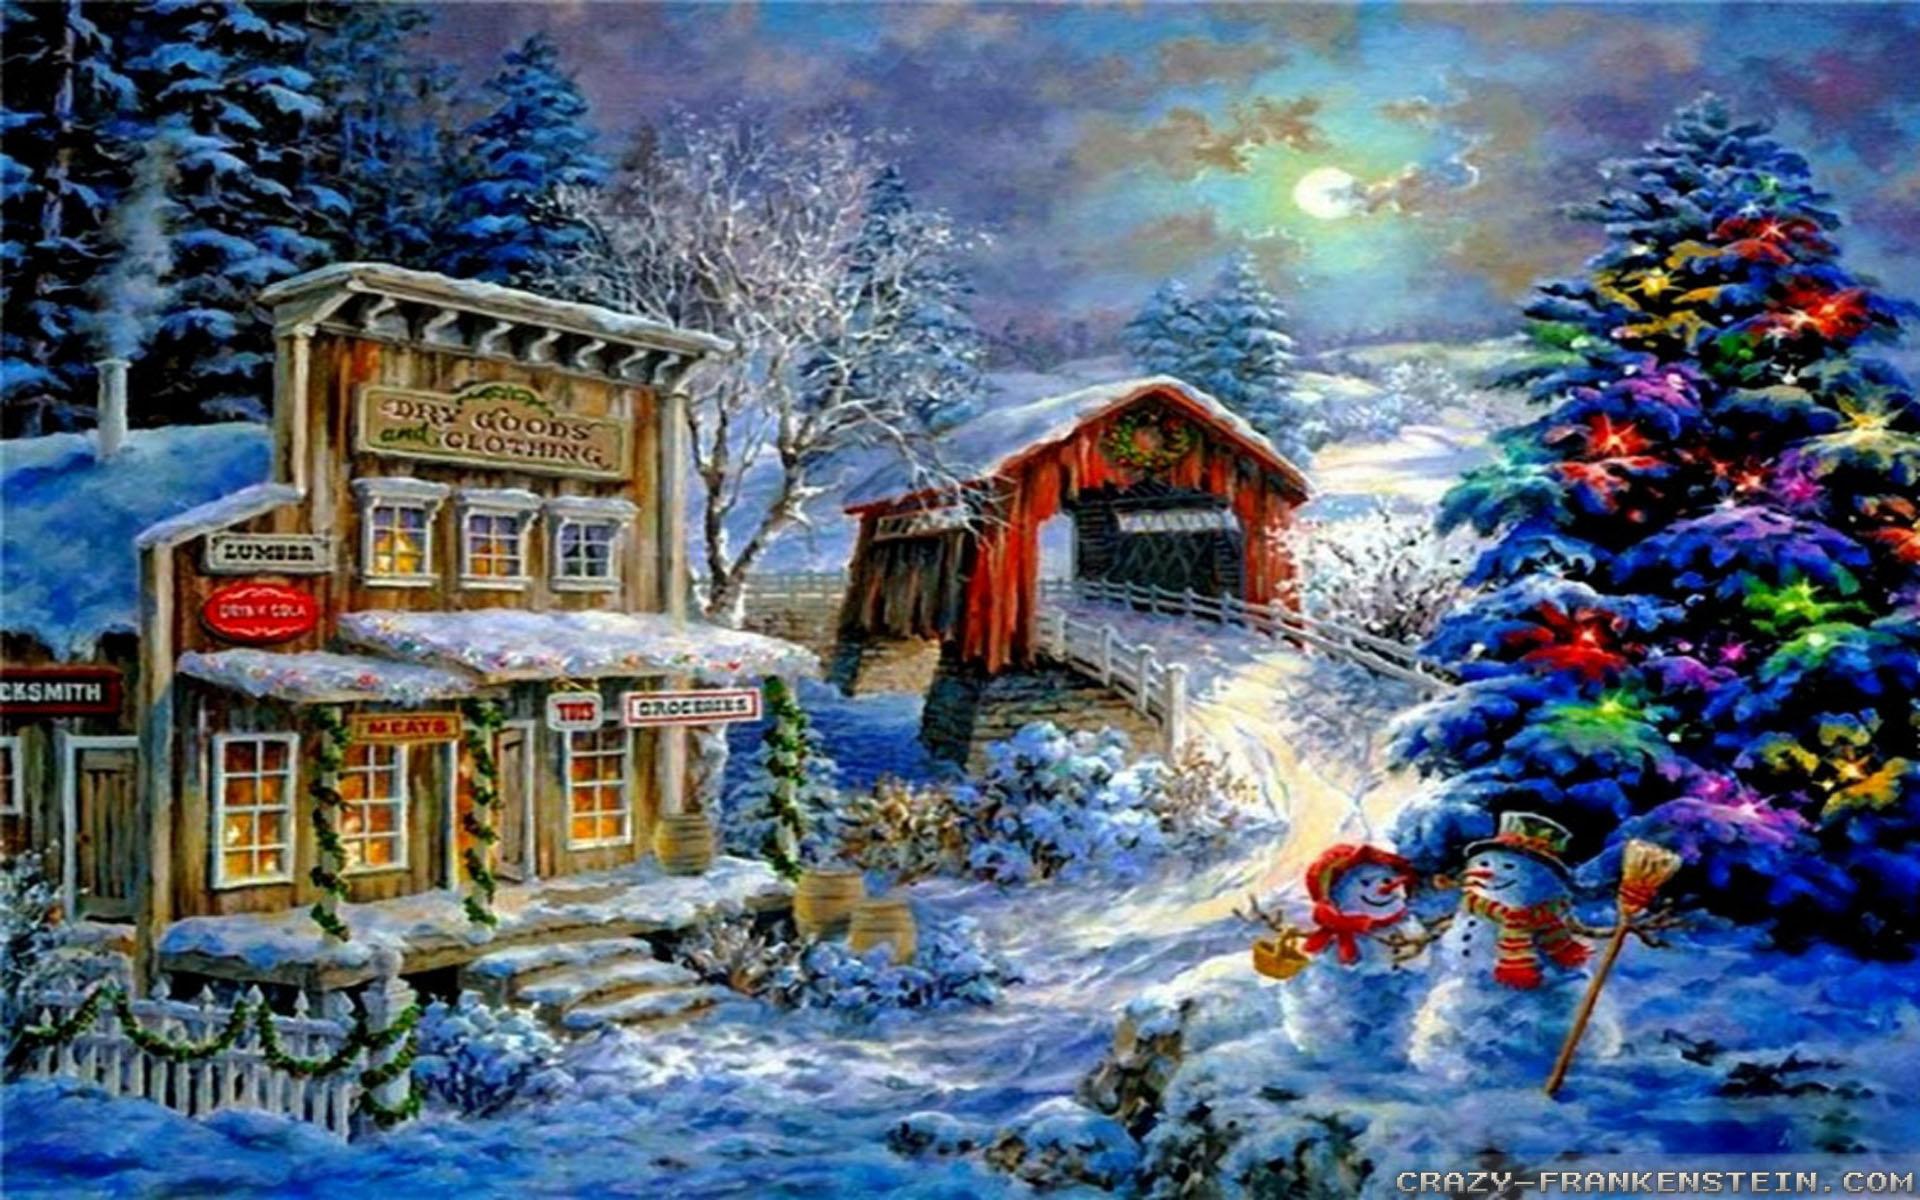 Download Winter Scene Wallpaper Gallery 1920x1200 1920x1200